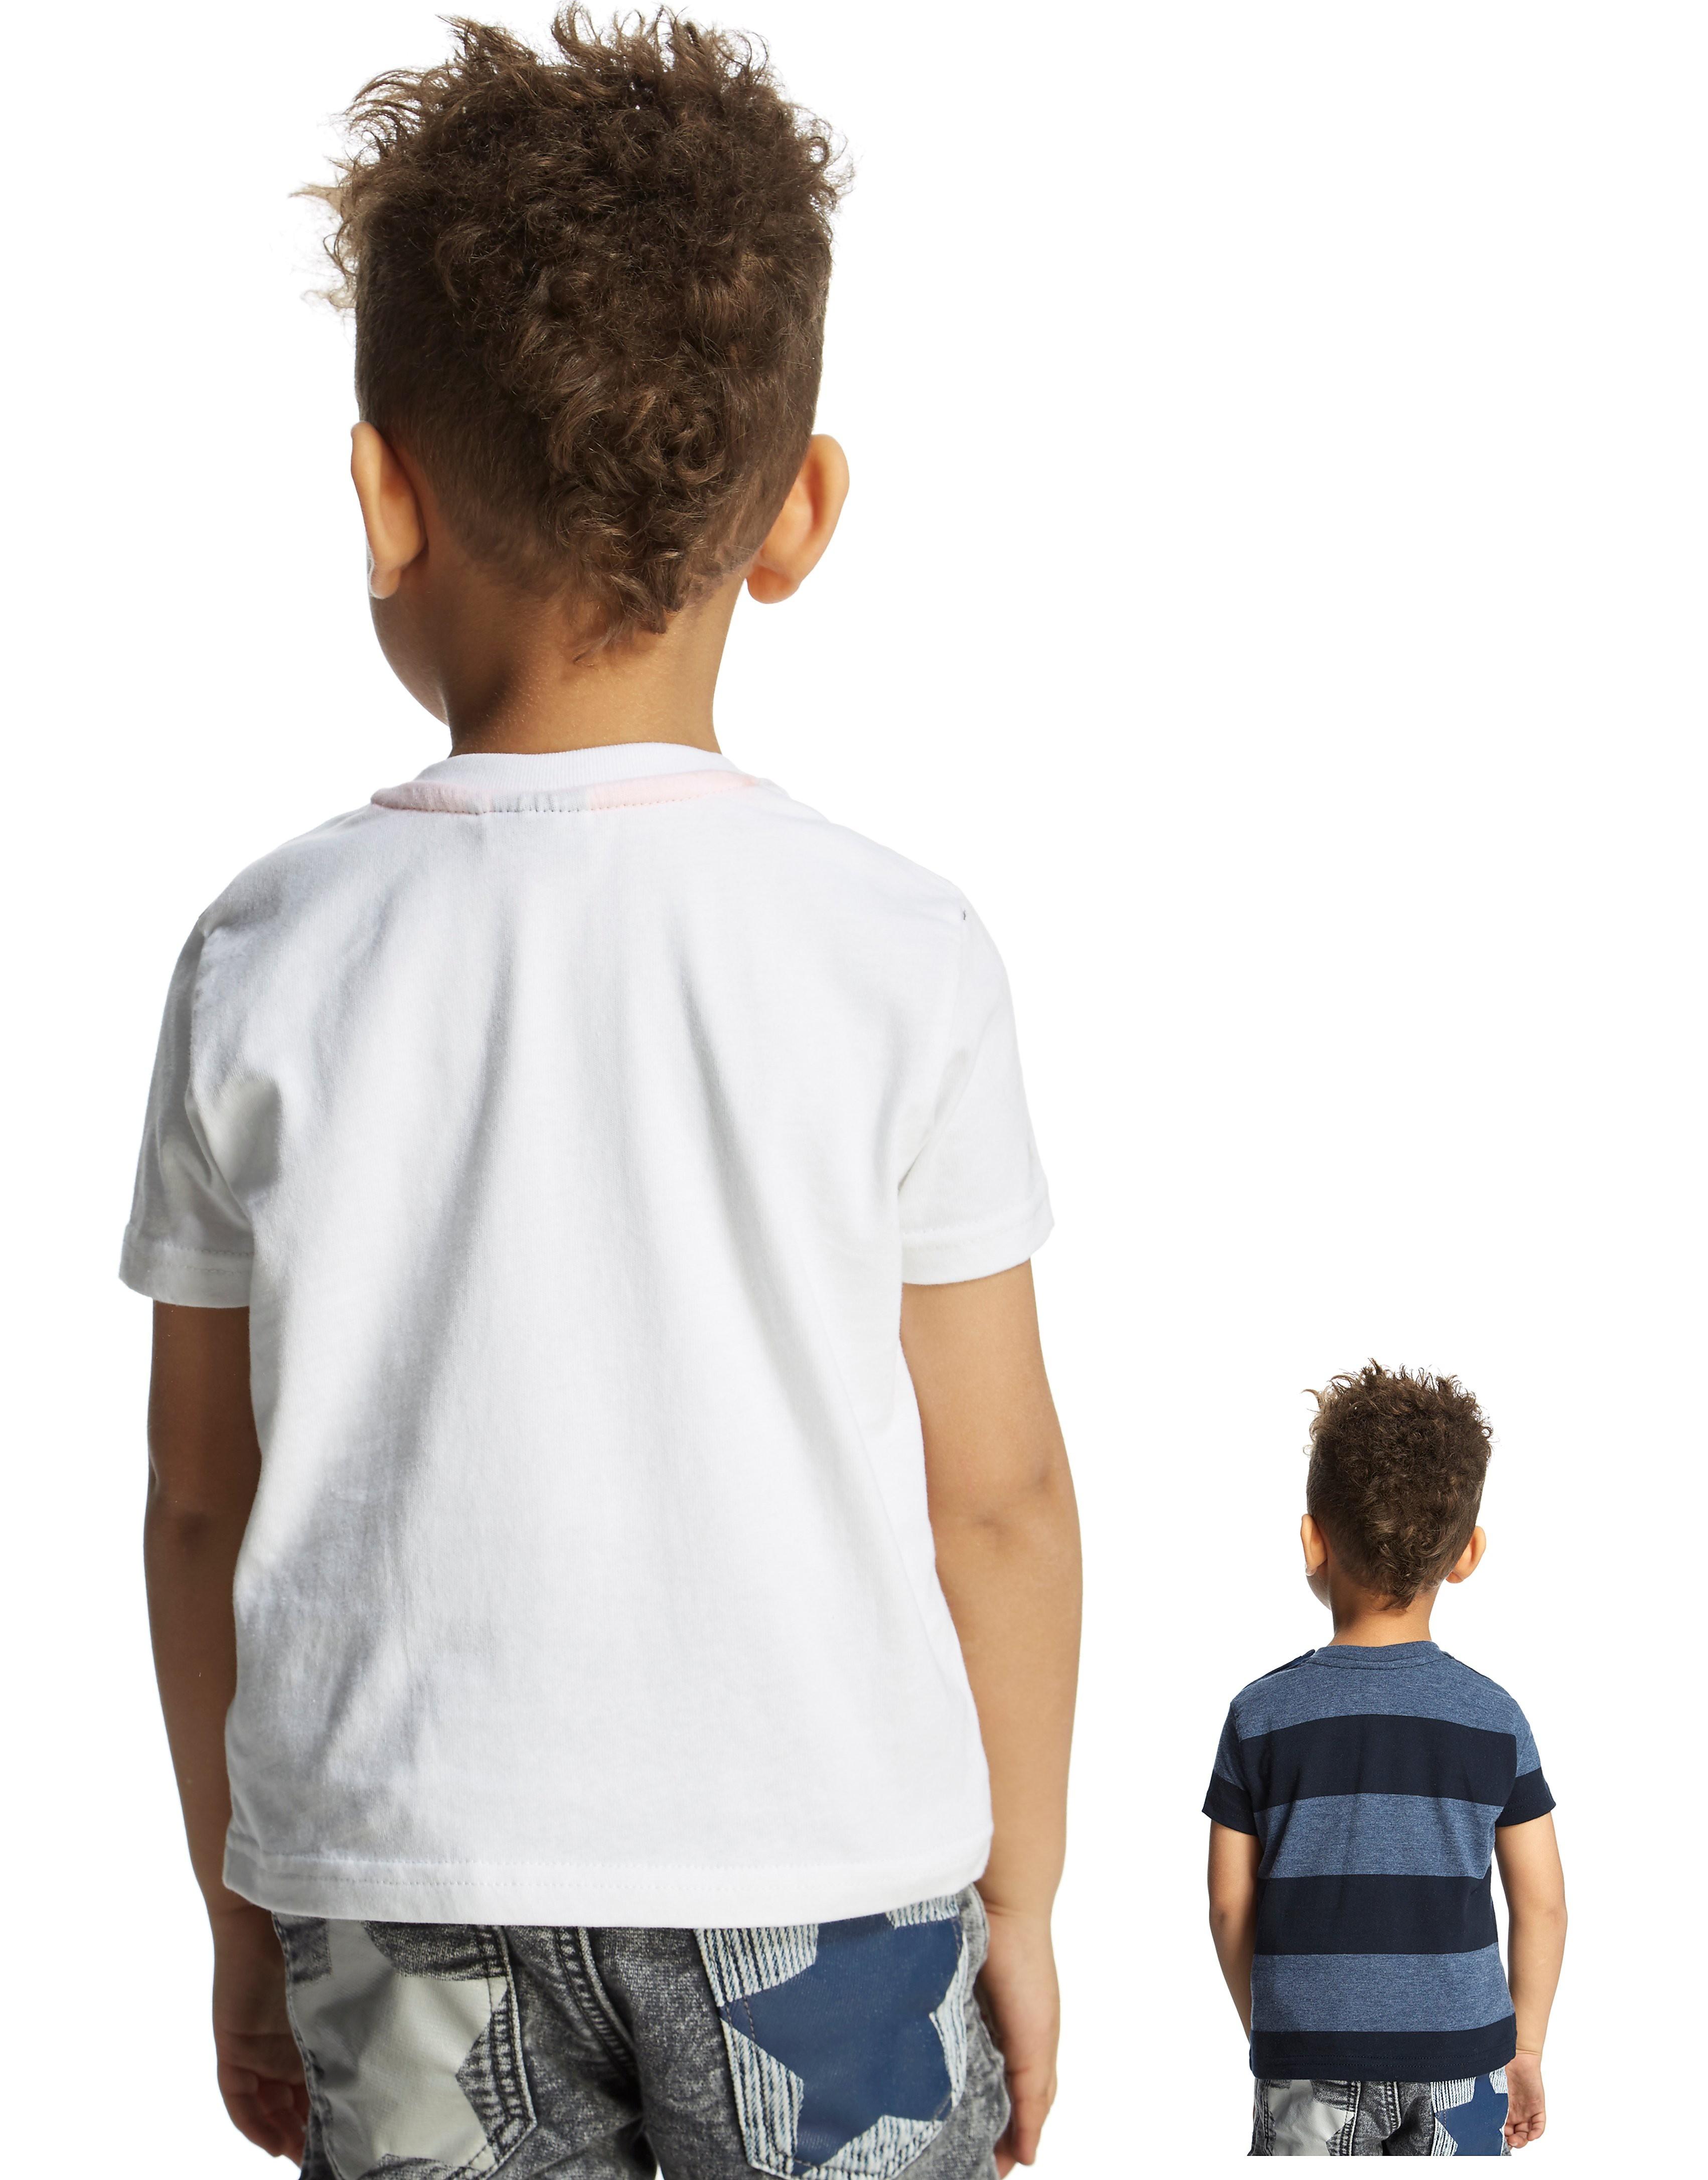 McKenzie Wells 2 Pack T-Shirt Infant